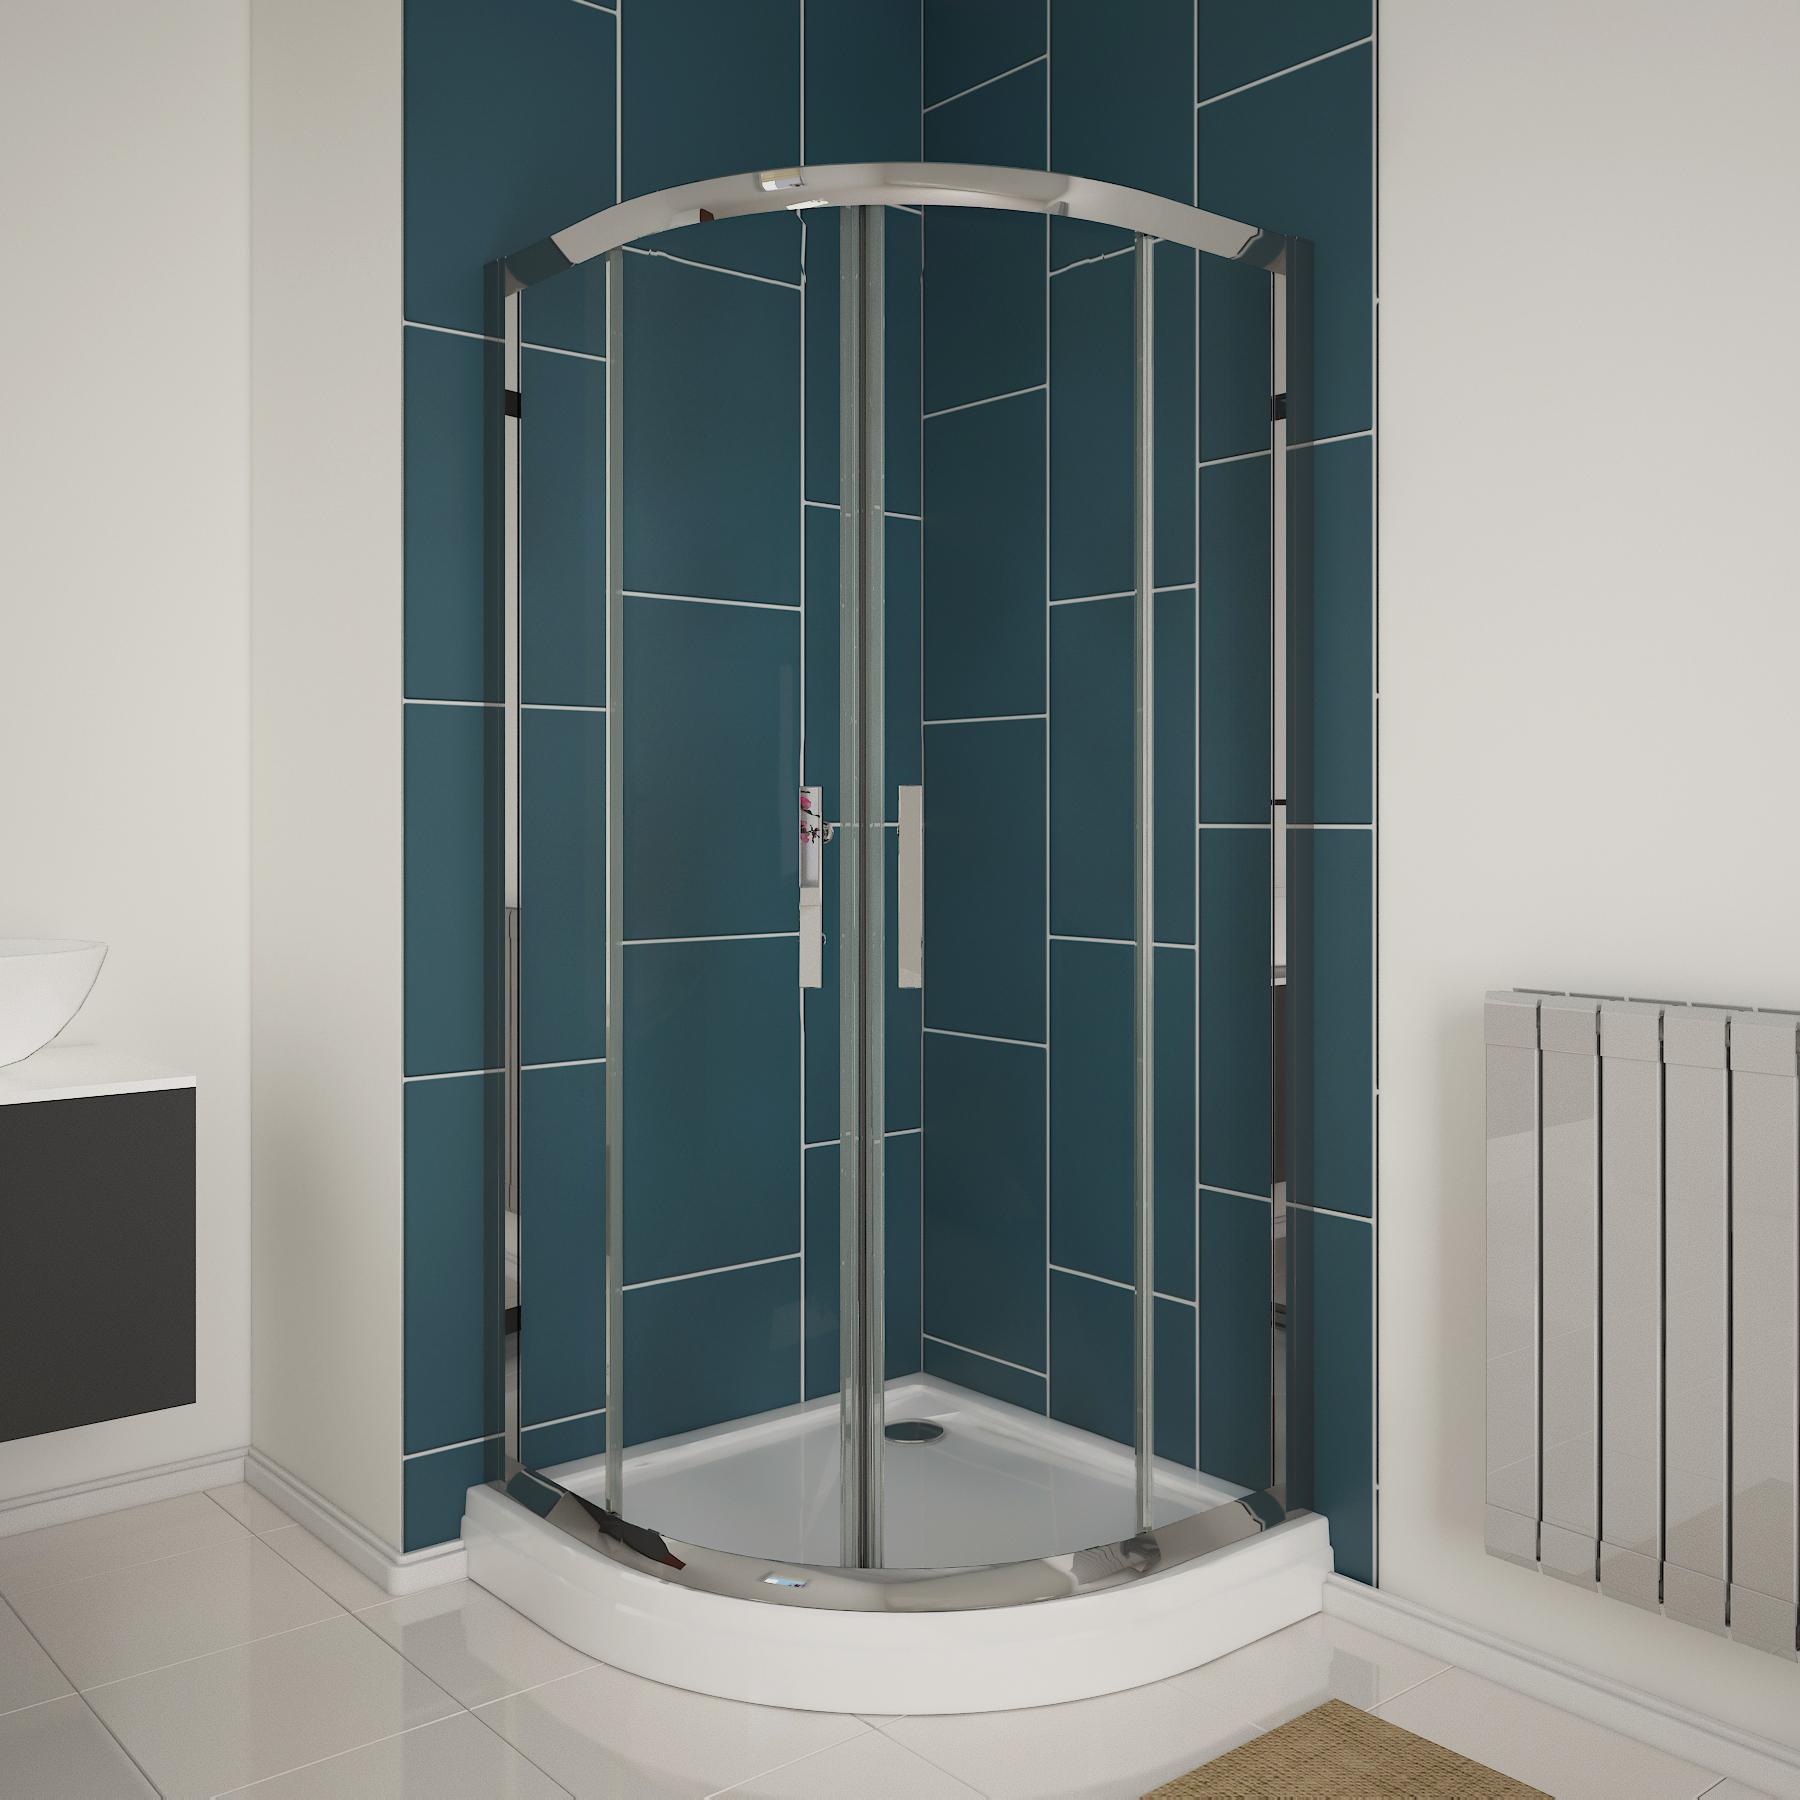 New 6mm glass quadrant shower enclosure walk in corner for 1150mm shower door